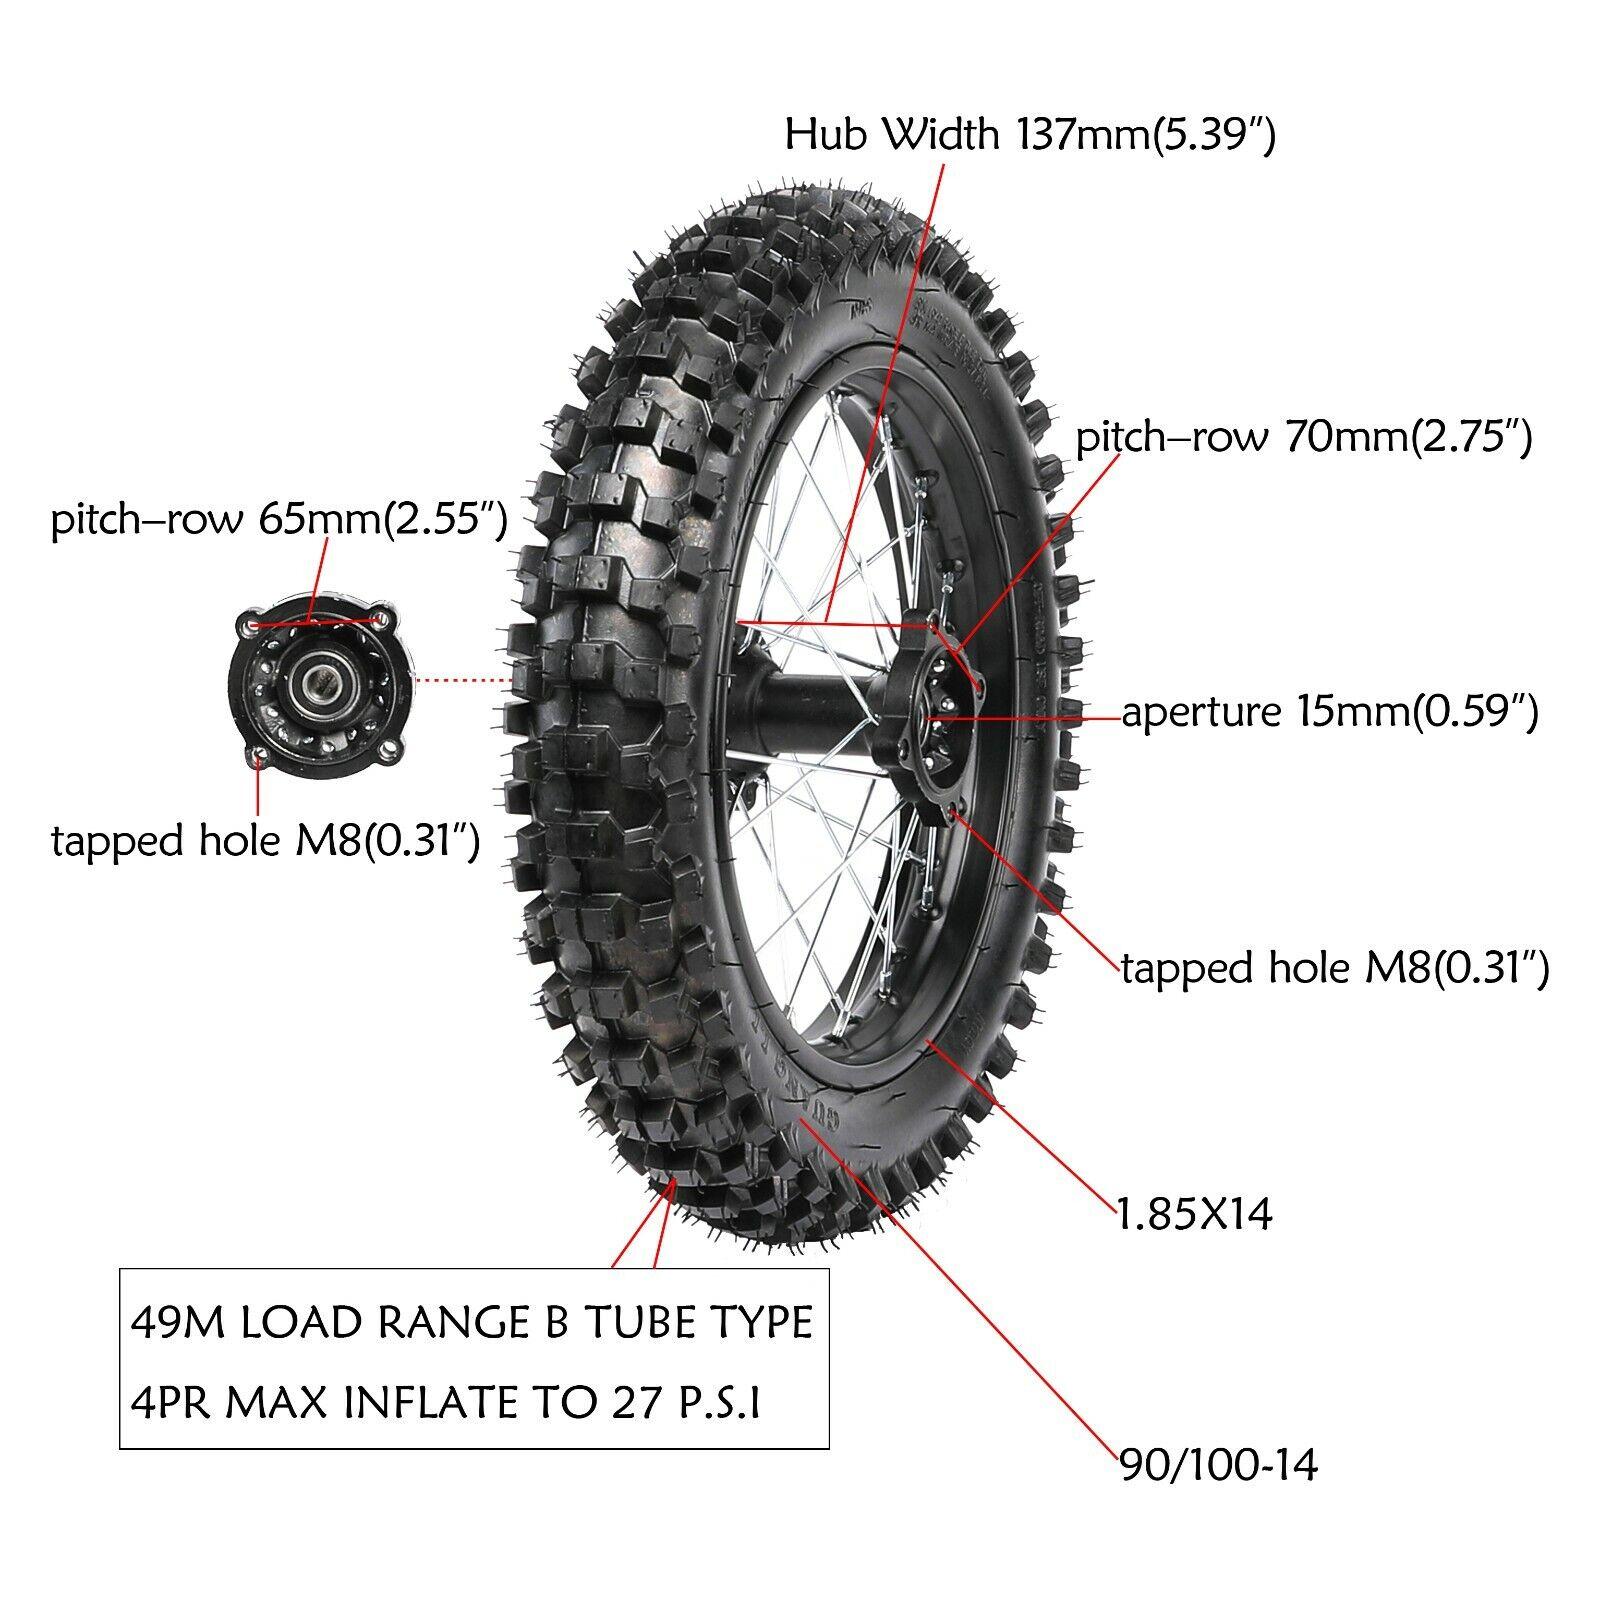 Pit Dirt Bike Motorcycle 15mm Axle 90/100-14 Rear Tire Rim